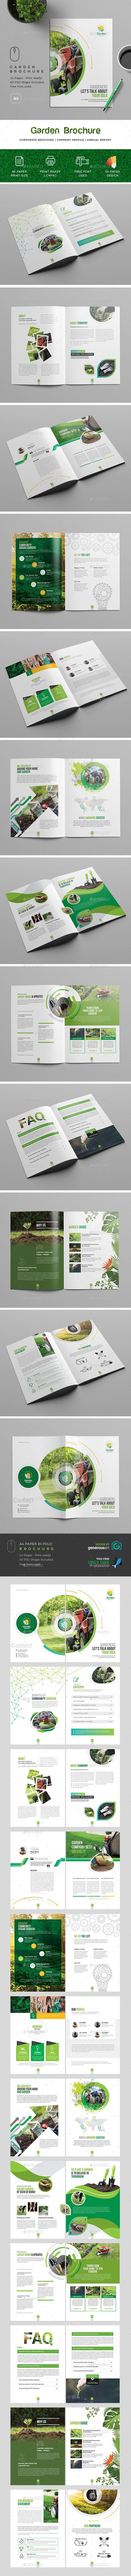 Garden Brochure Template 24 Page - #Brochures Print Templates